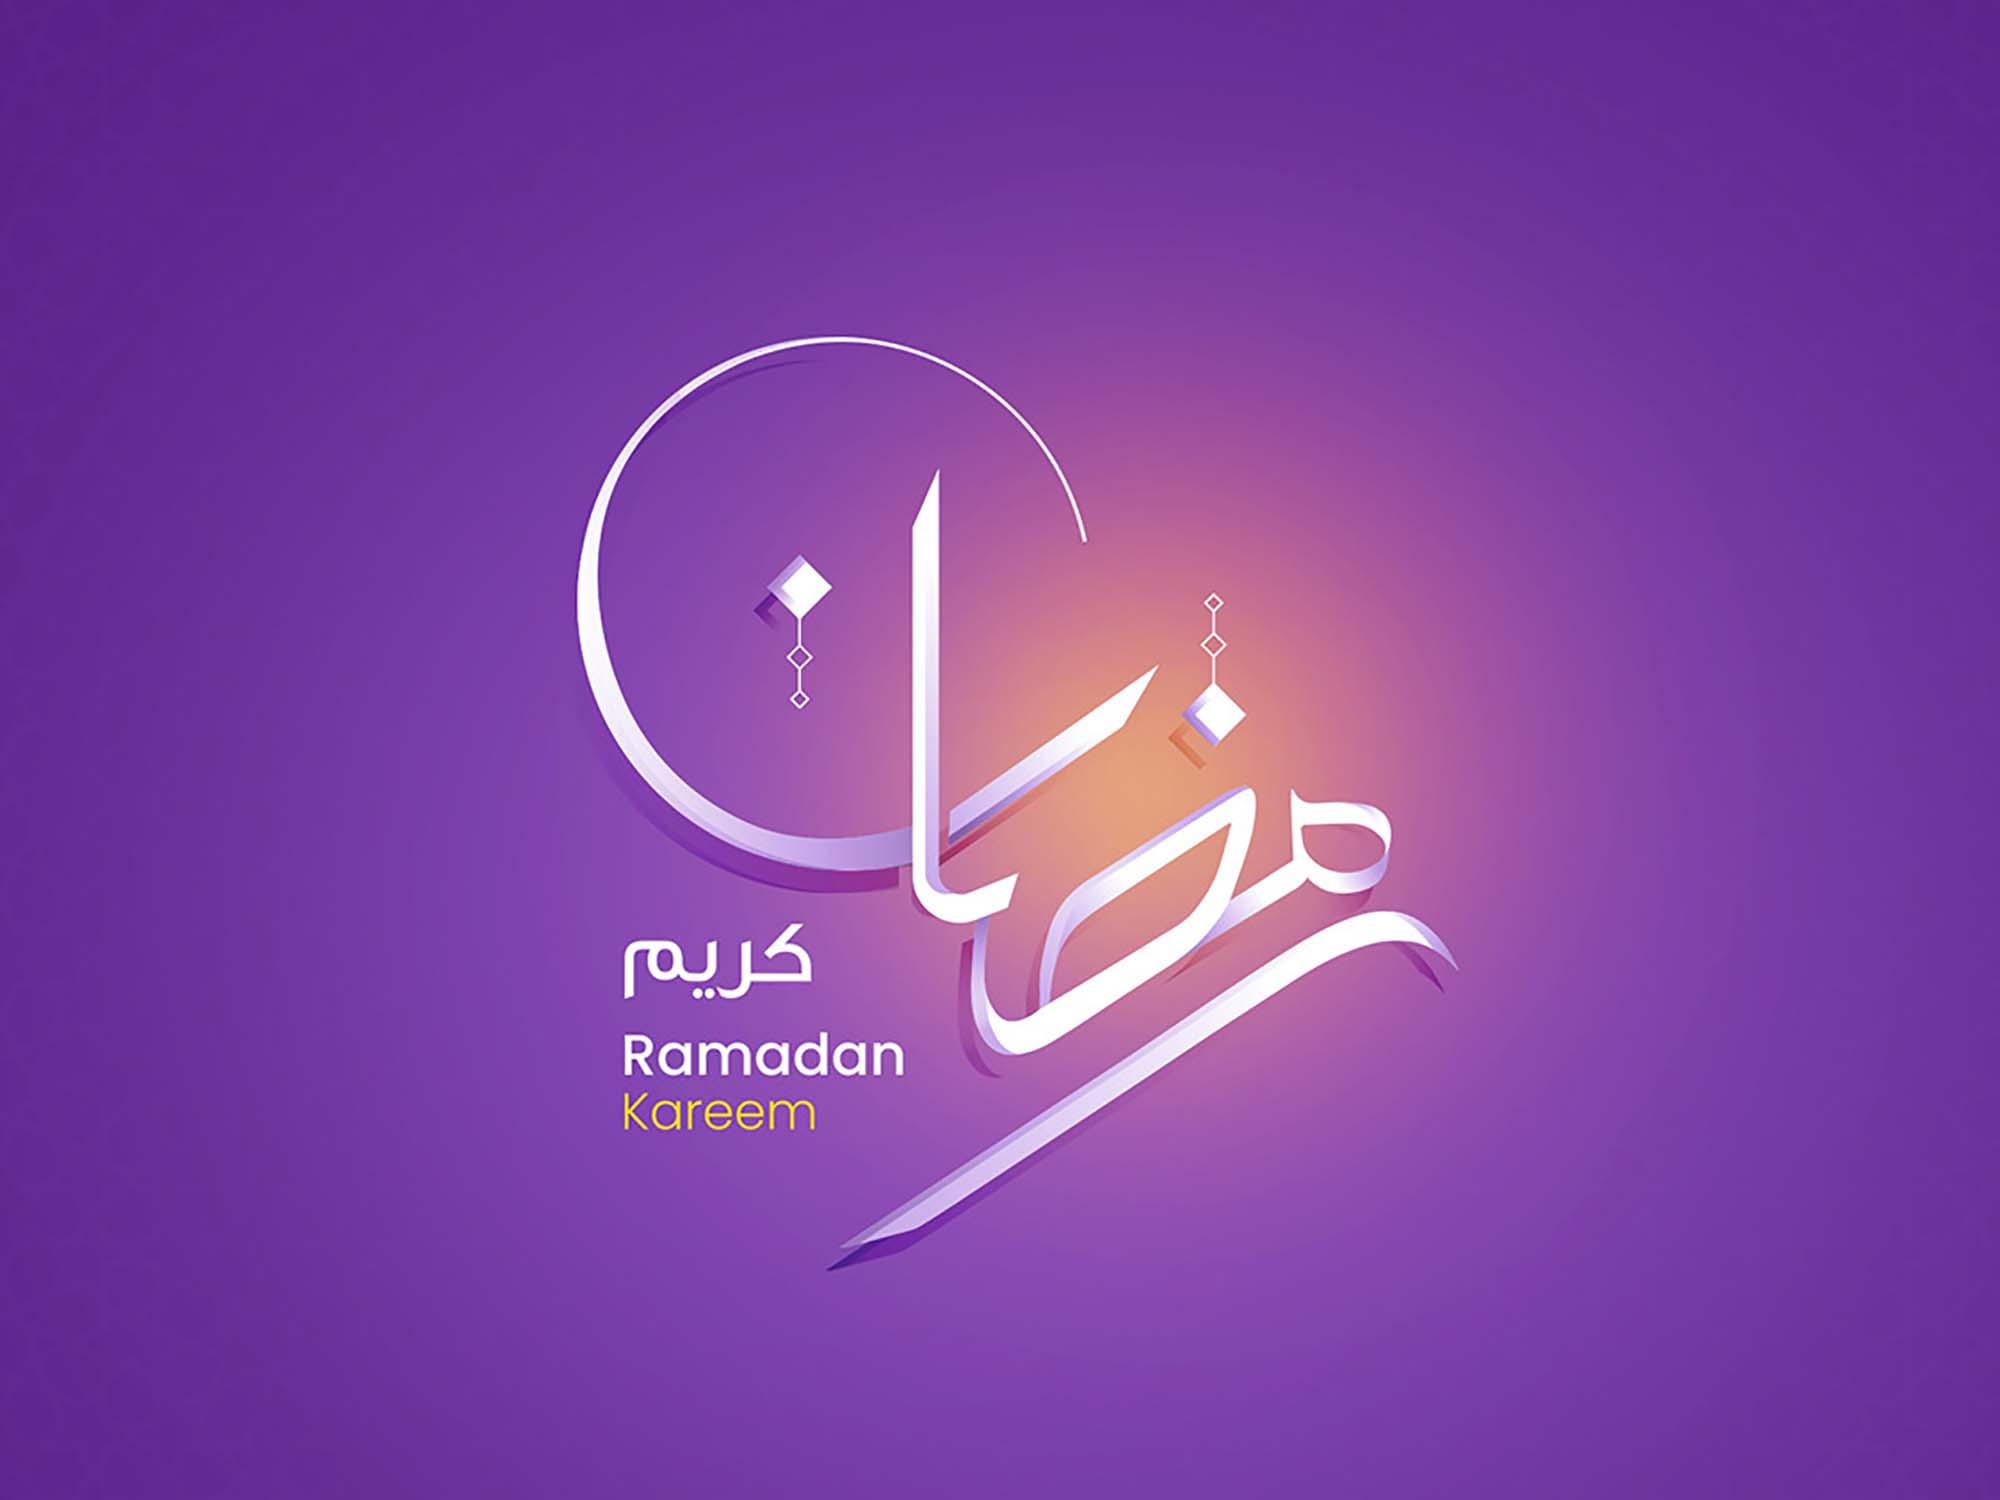 Ramadan Typography Template 5